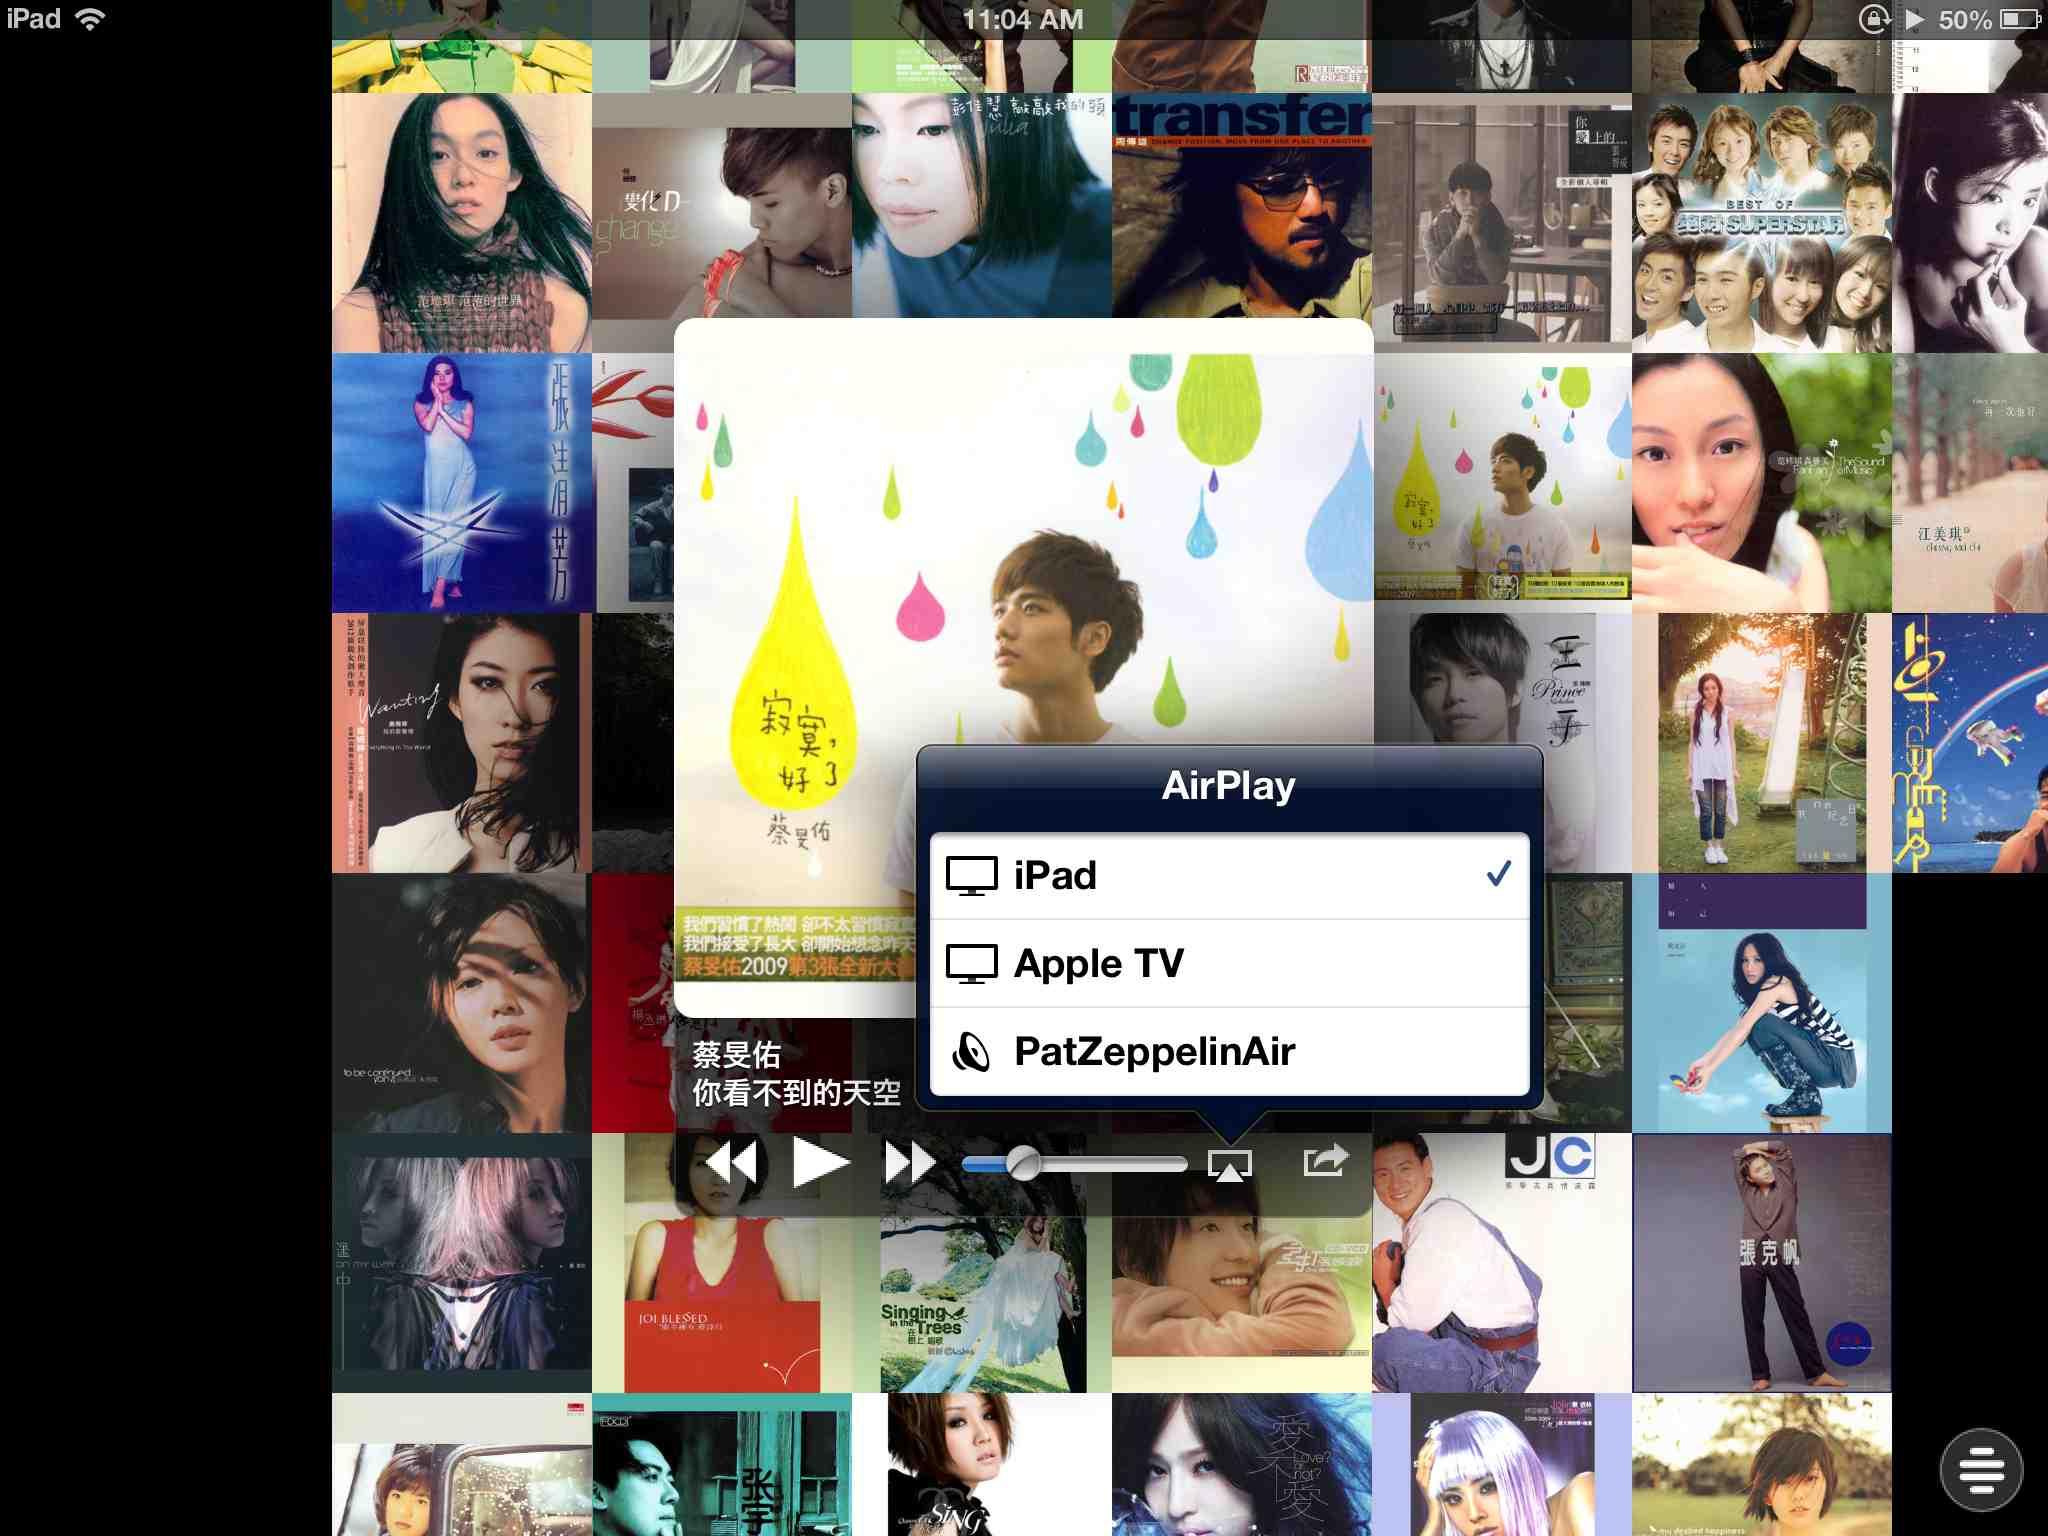 AirPlay AirPlay AirPlay Everywhere